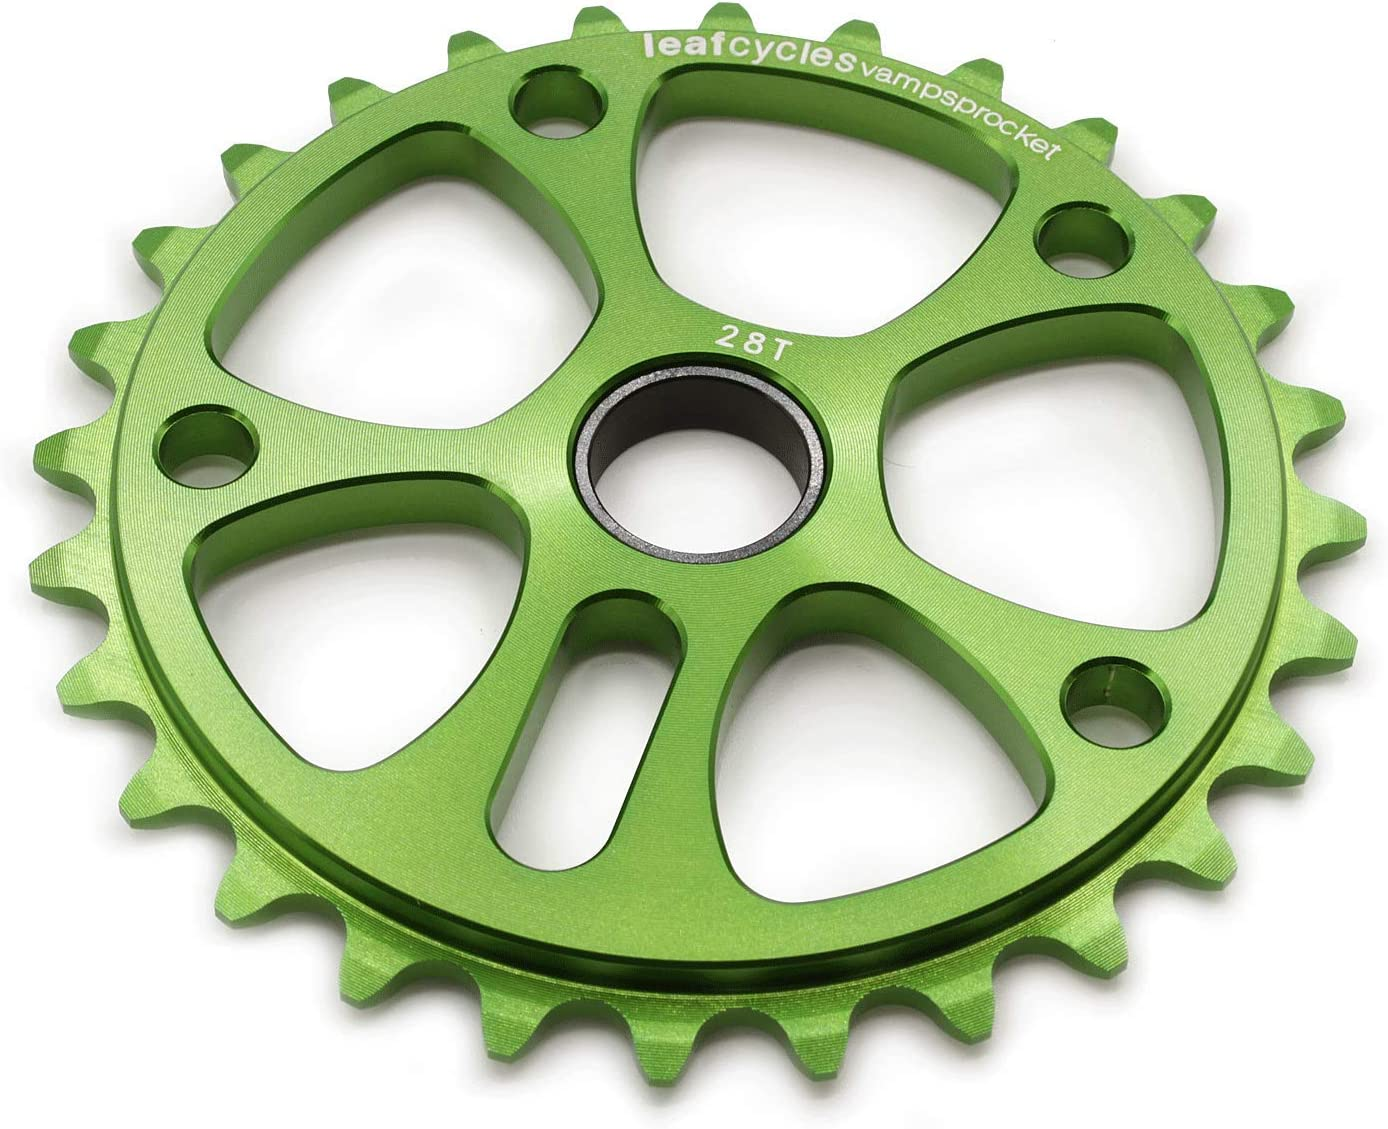 Leafcycles Dirtjumping /& BMX Kettenblatt aus 7075 Aluminium f/ür 19 mm Achsen